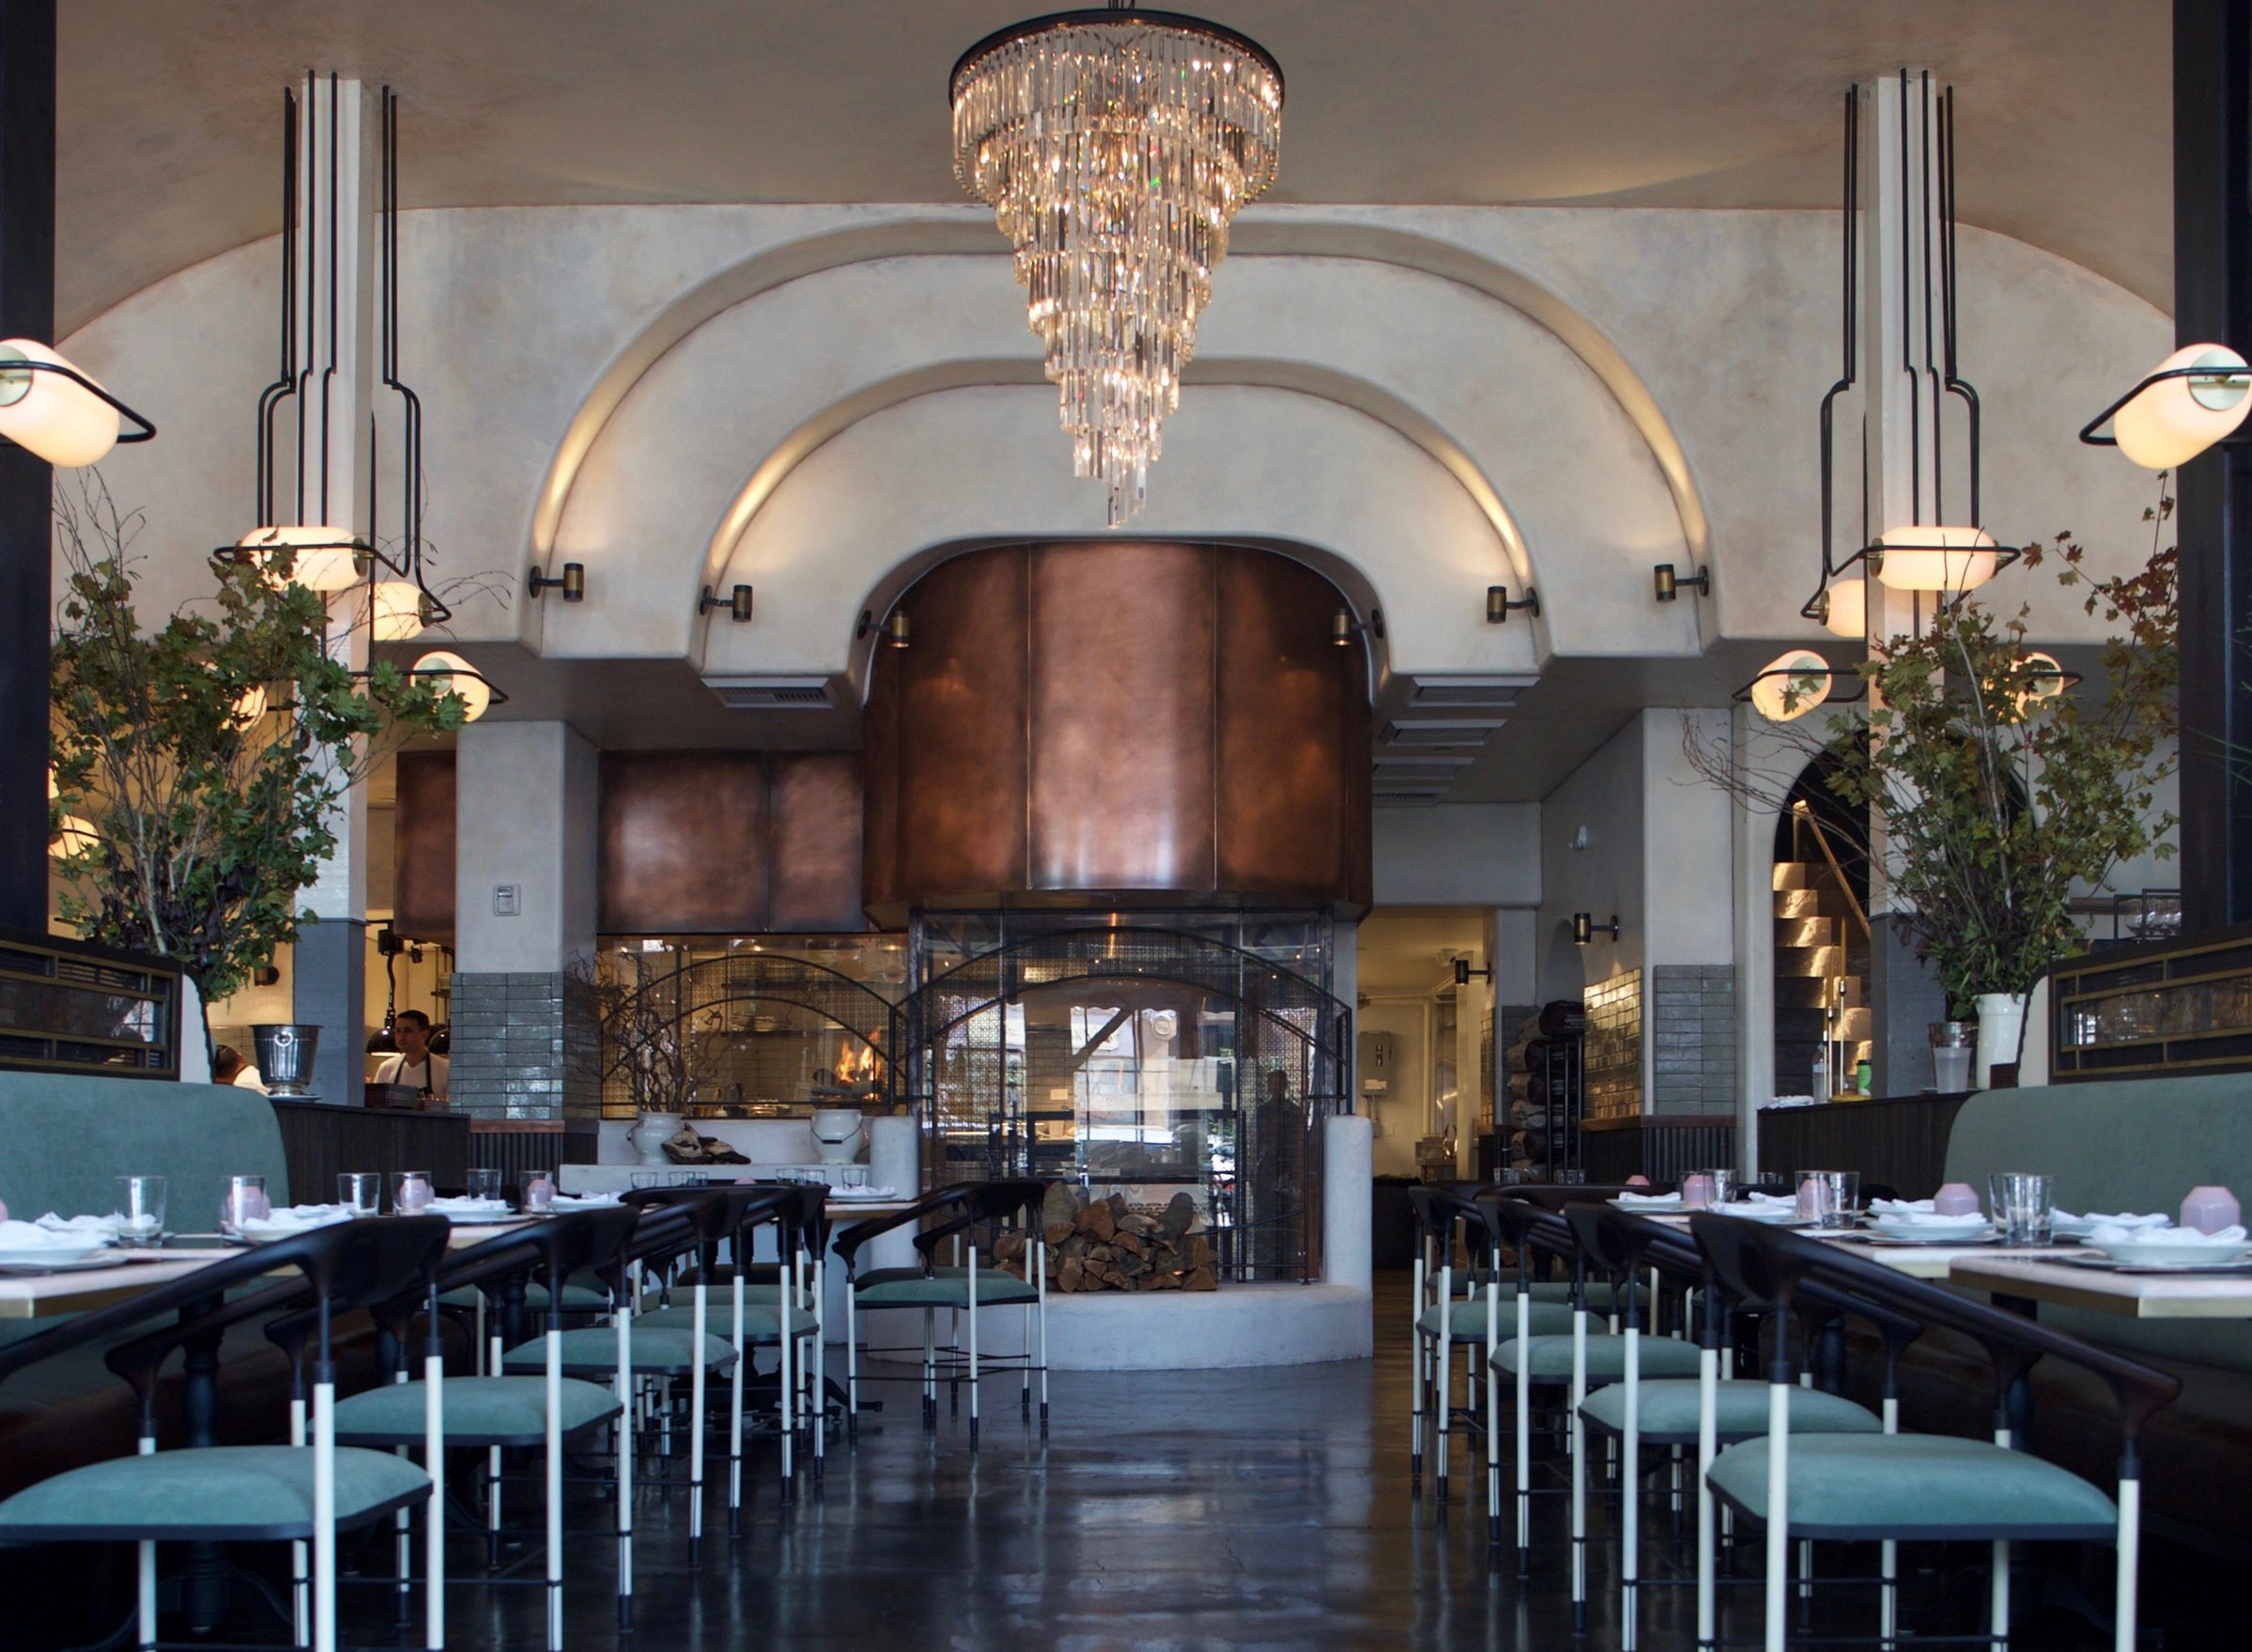 bar interiors design 2. LOVE The Iron Bars That Give Columns Shape And Transparancy! Gwen Restaurant \u0026 Butcher Shop, Hollywood - Cool Hunter Bar Interiors Design 2